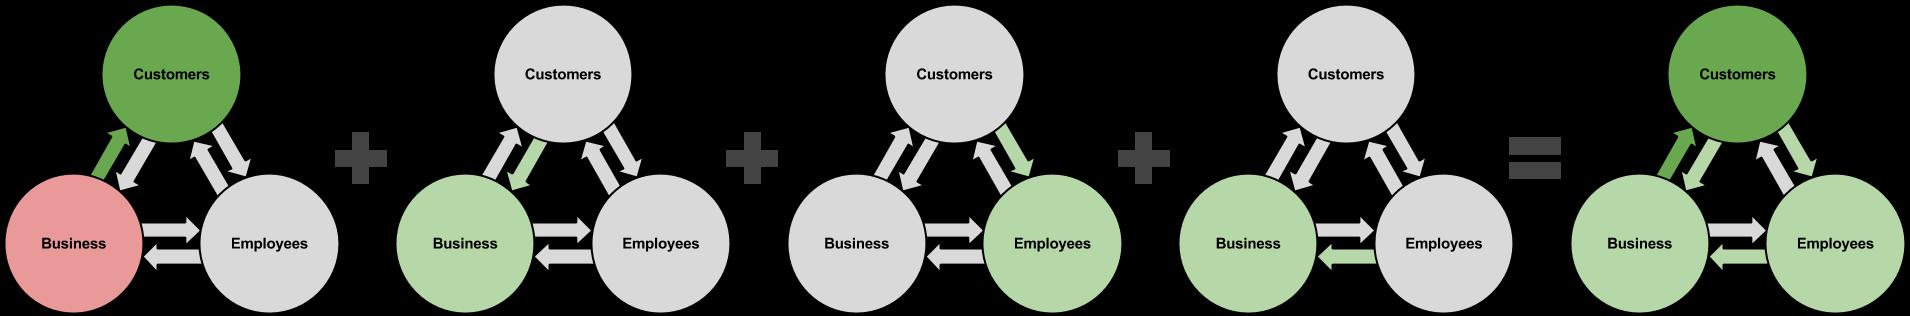 BEx Model - Improve Quality